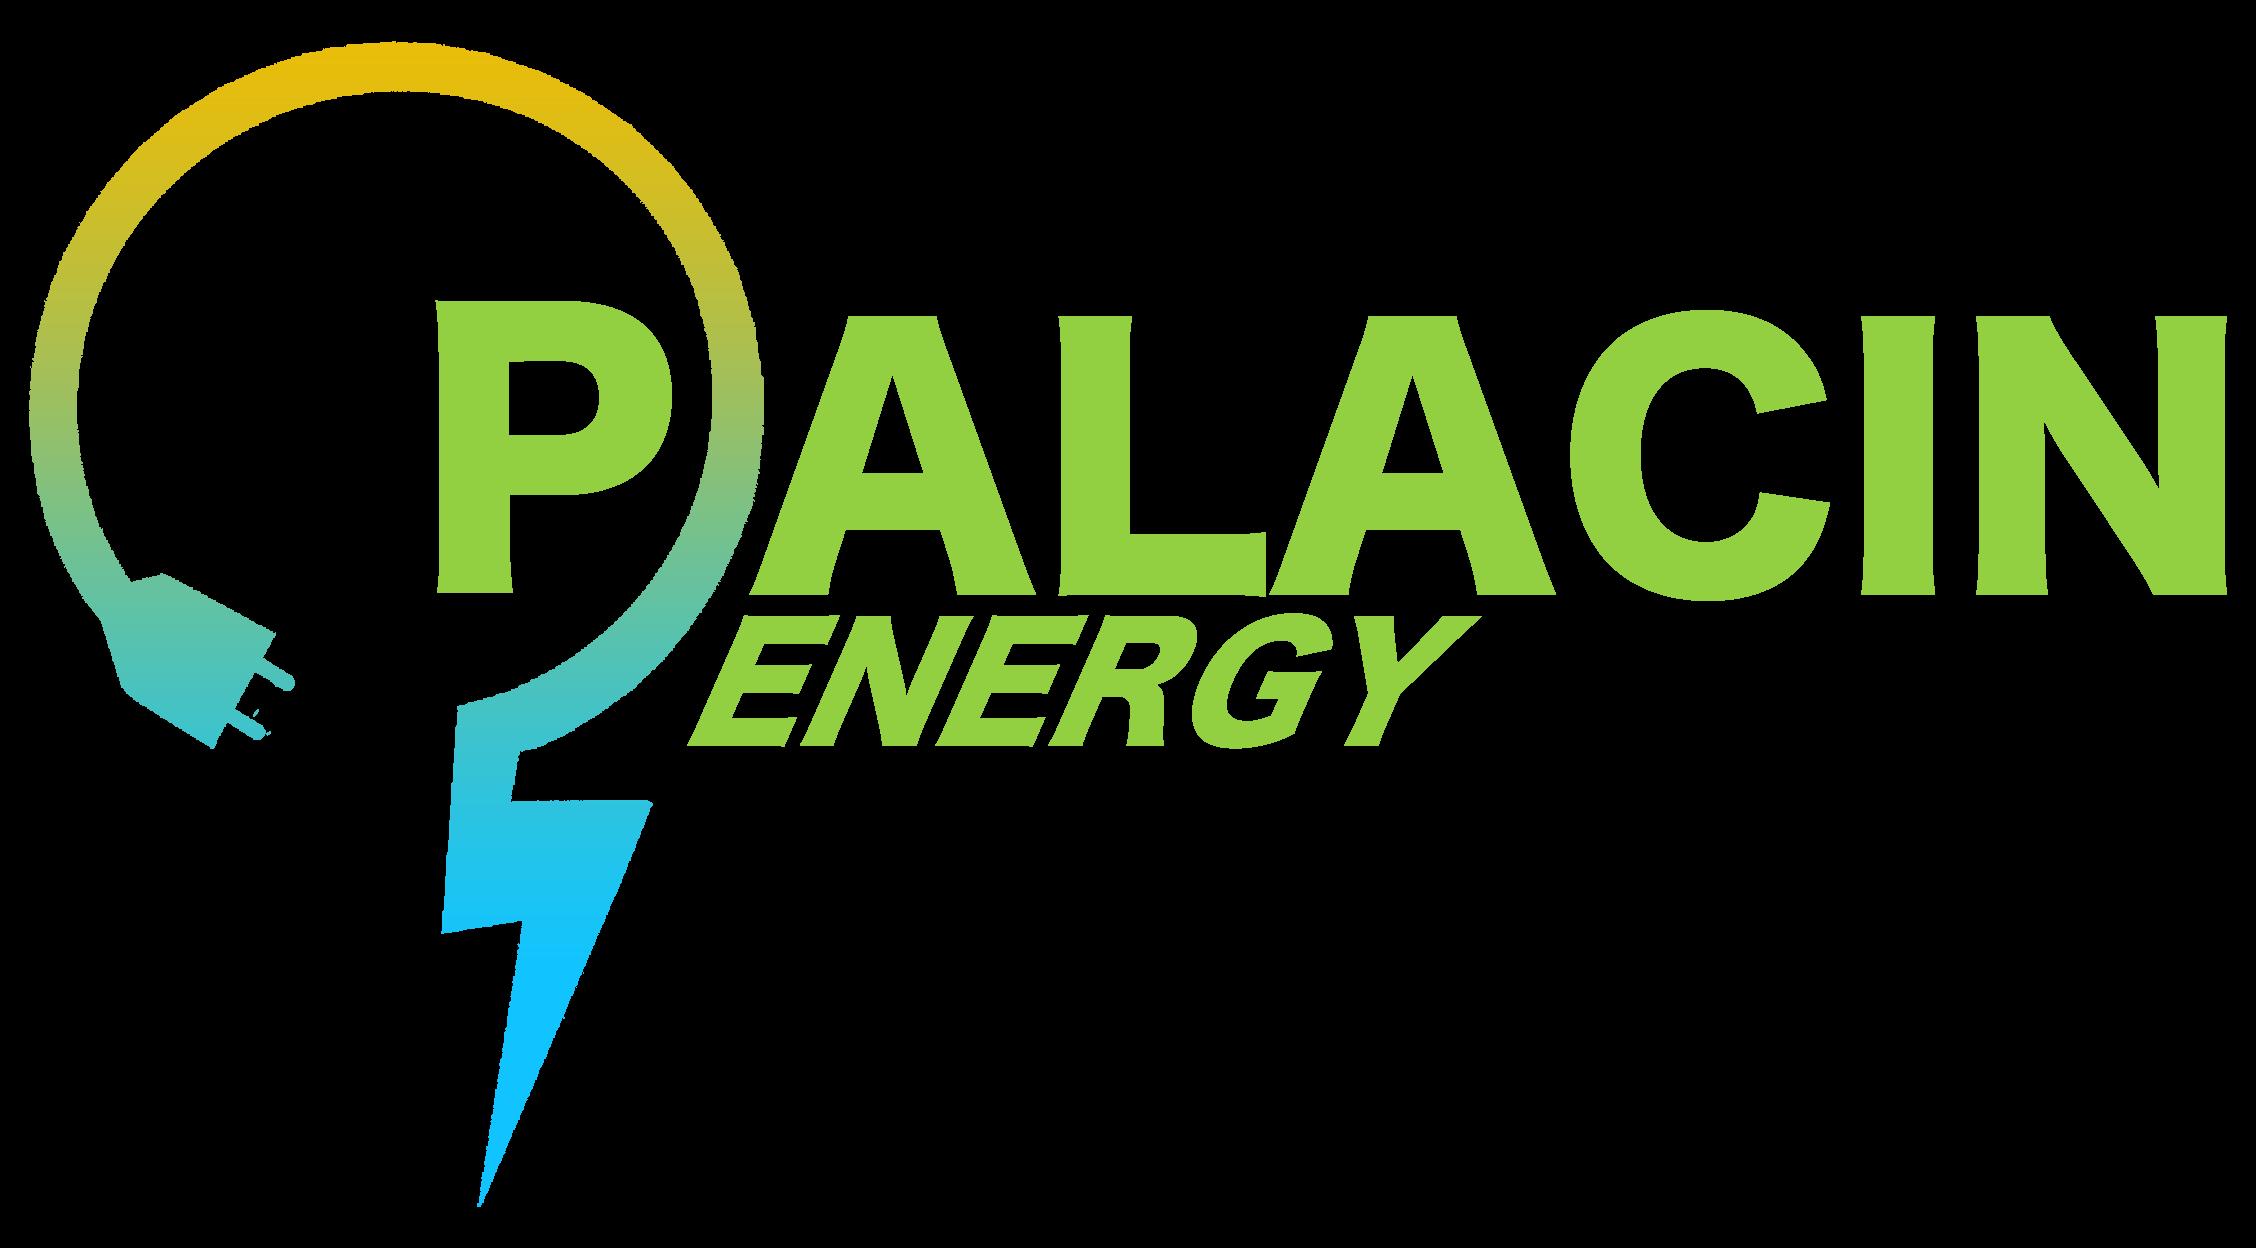 Palacin